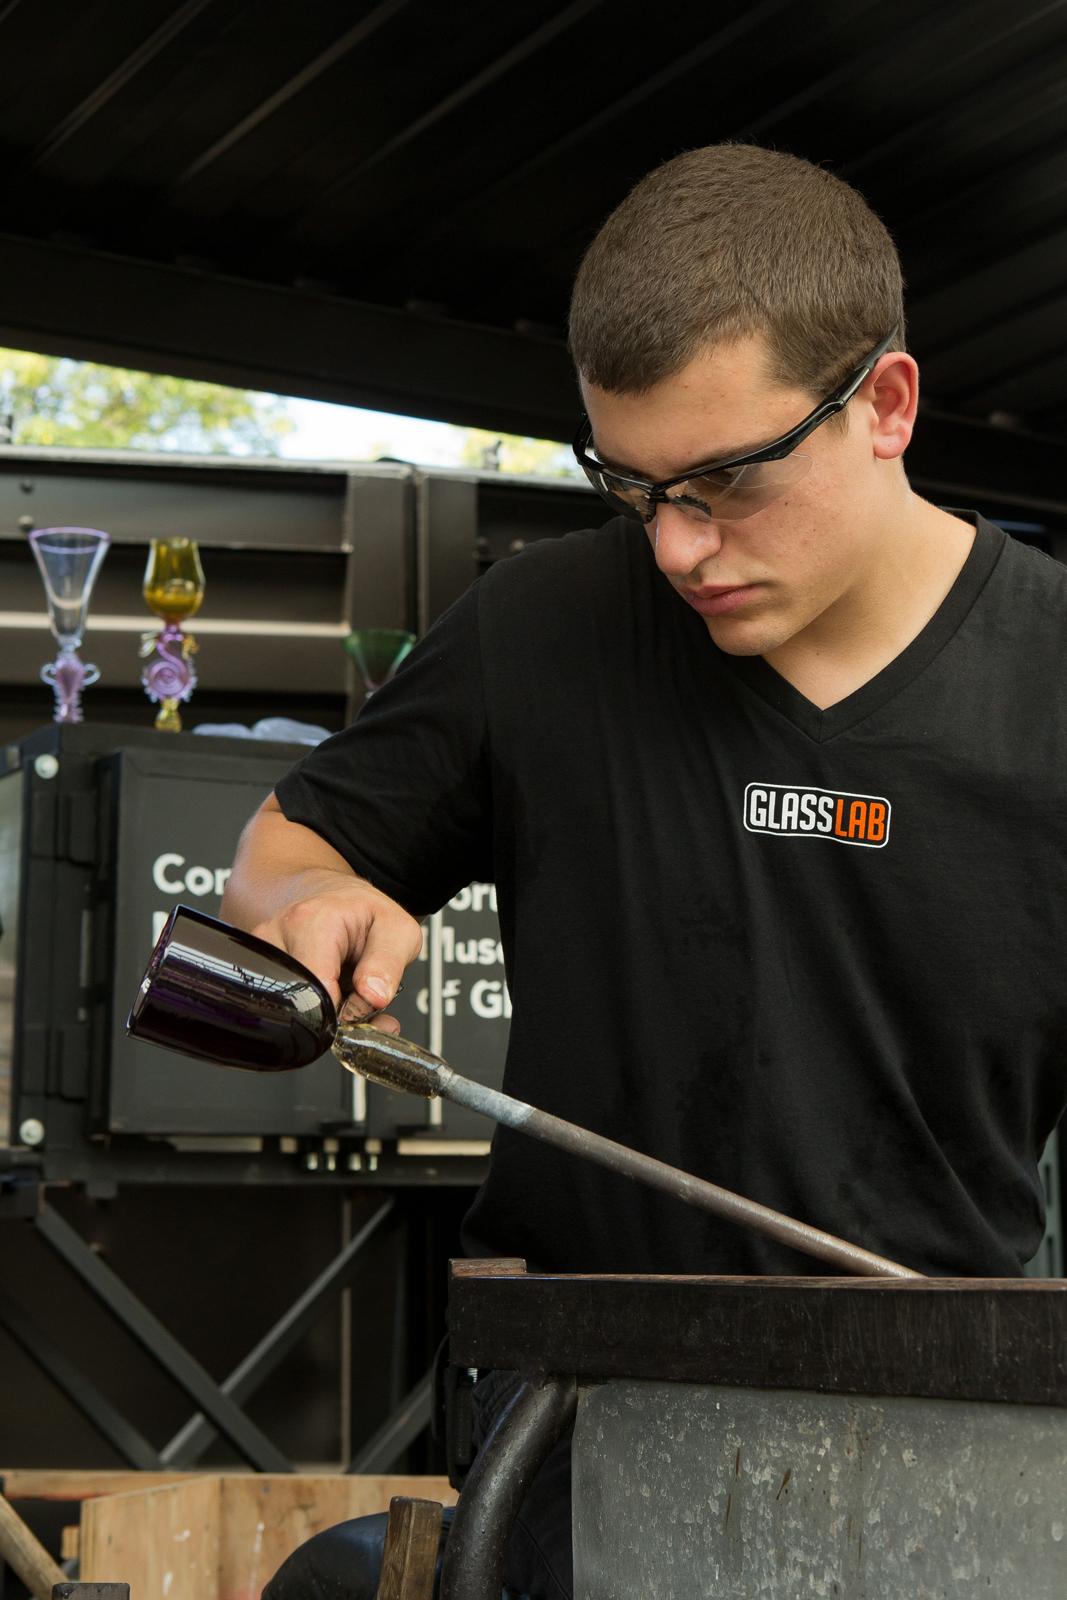 Glassmaker Tom Ryder works with Harry Allen and Chris Hacker at GlassLab in Corning, August 2012